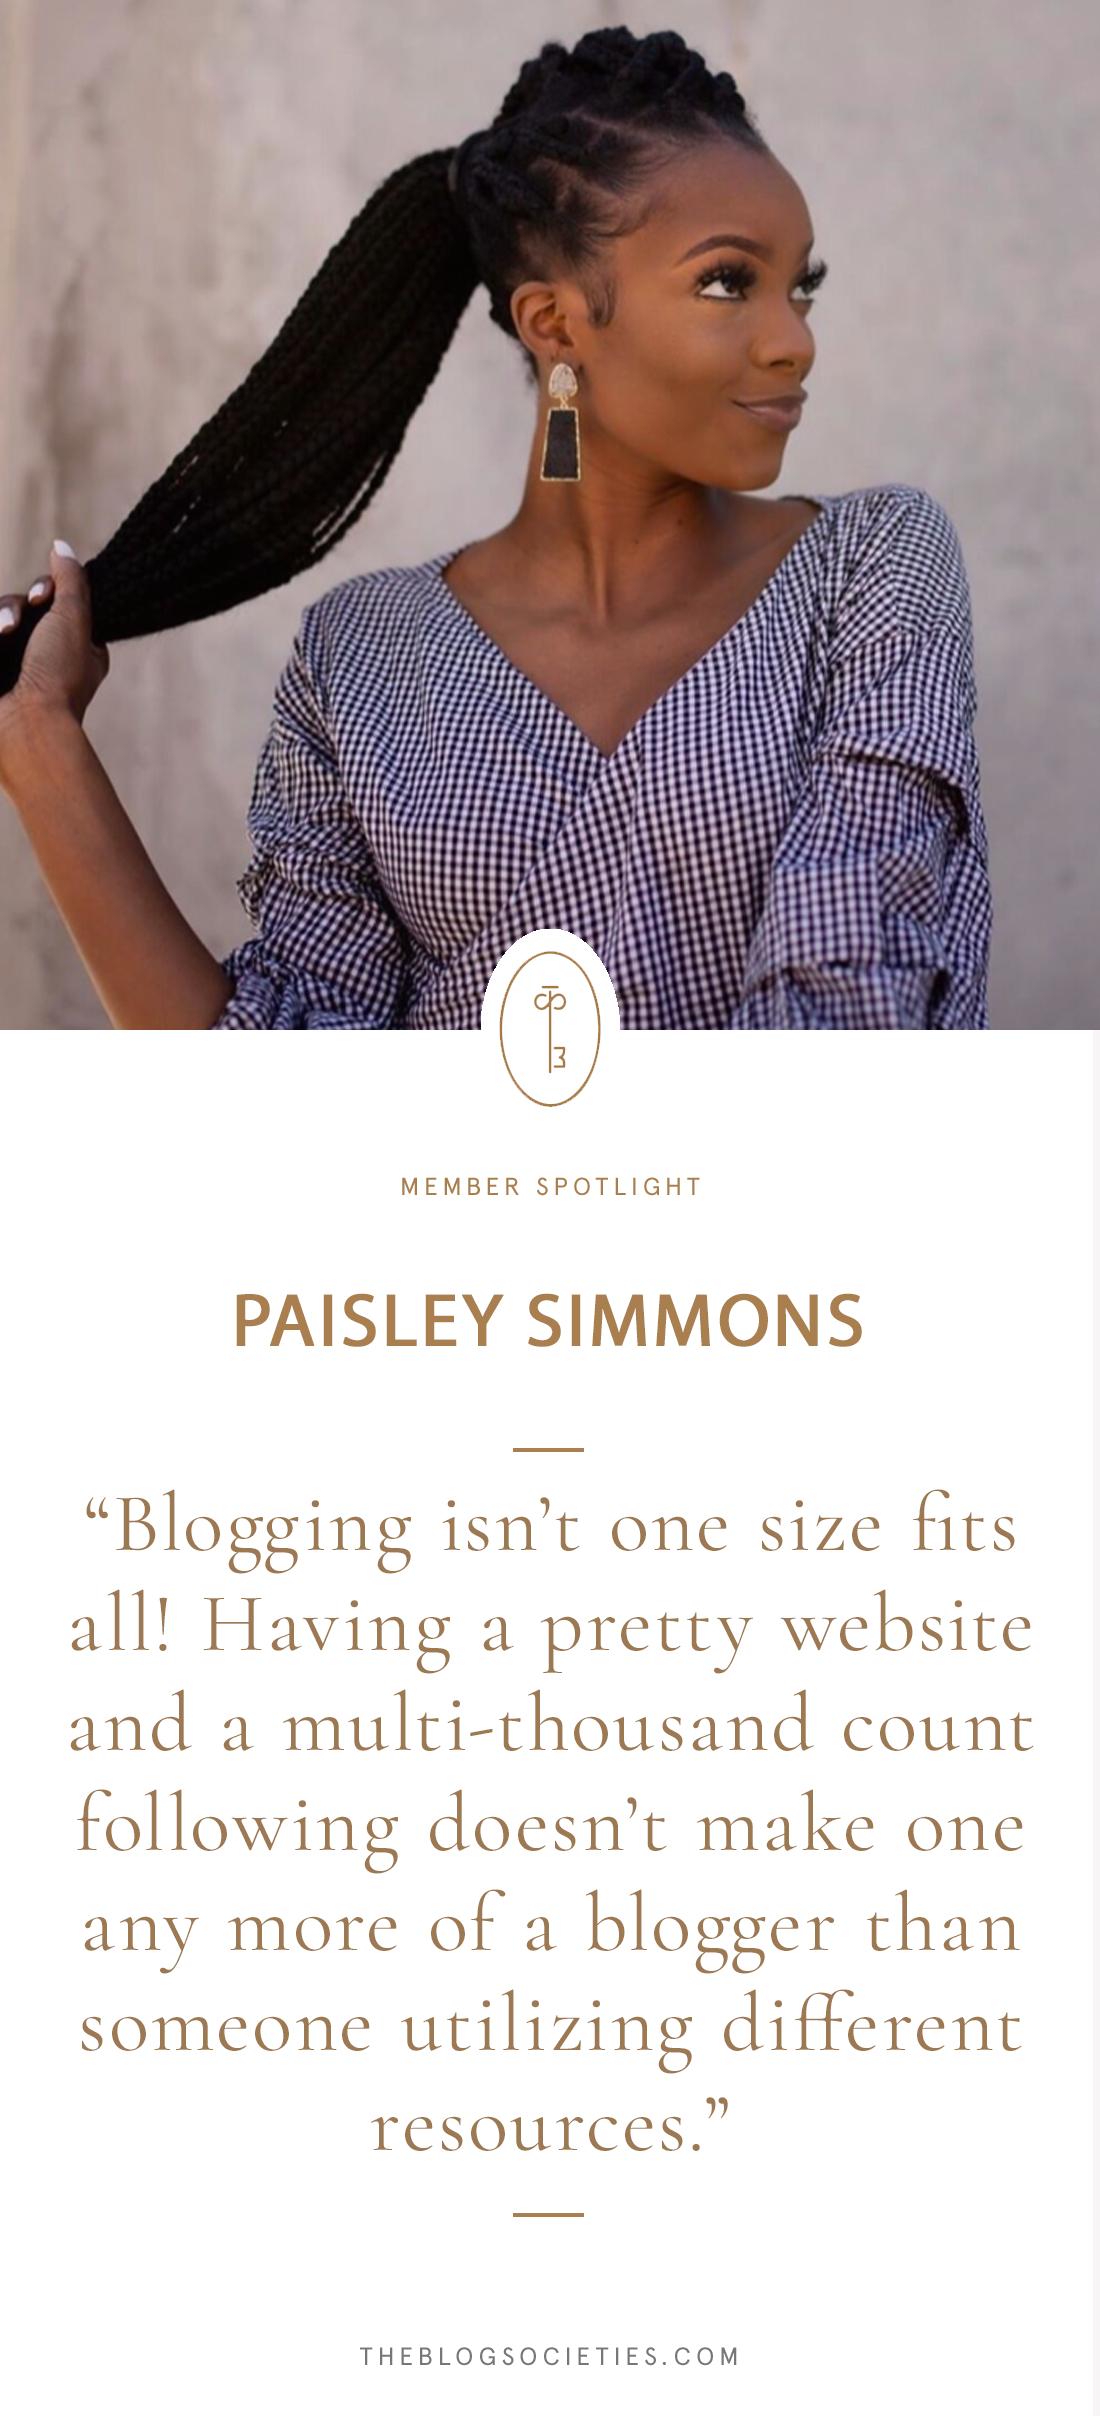 Member Spotlight: Paisley Simmons | The Blog Societies